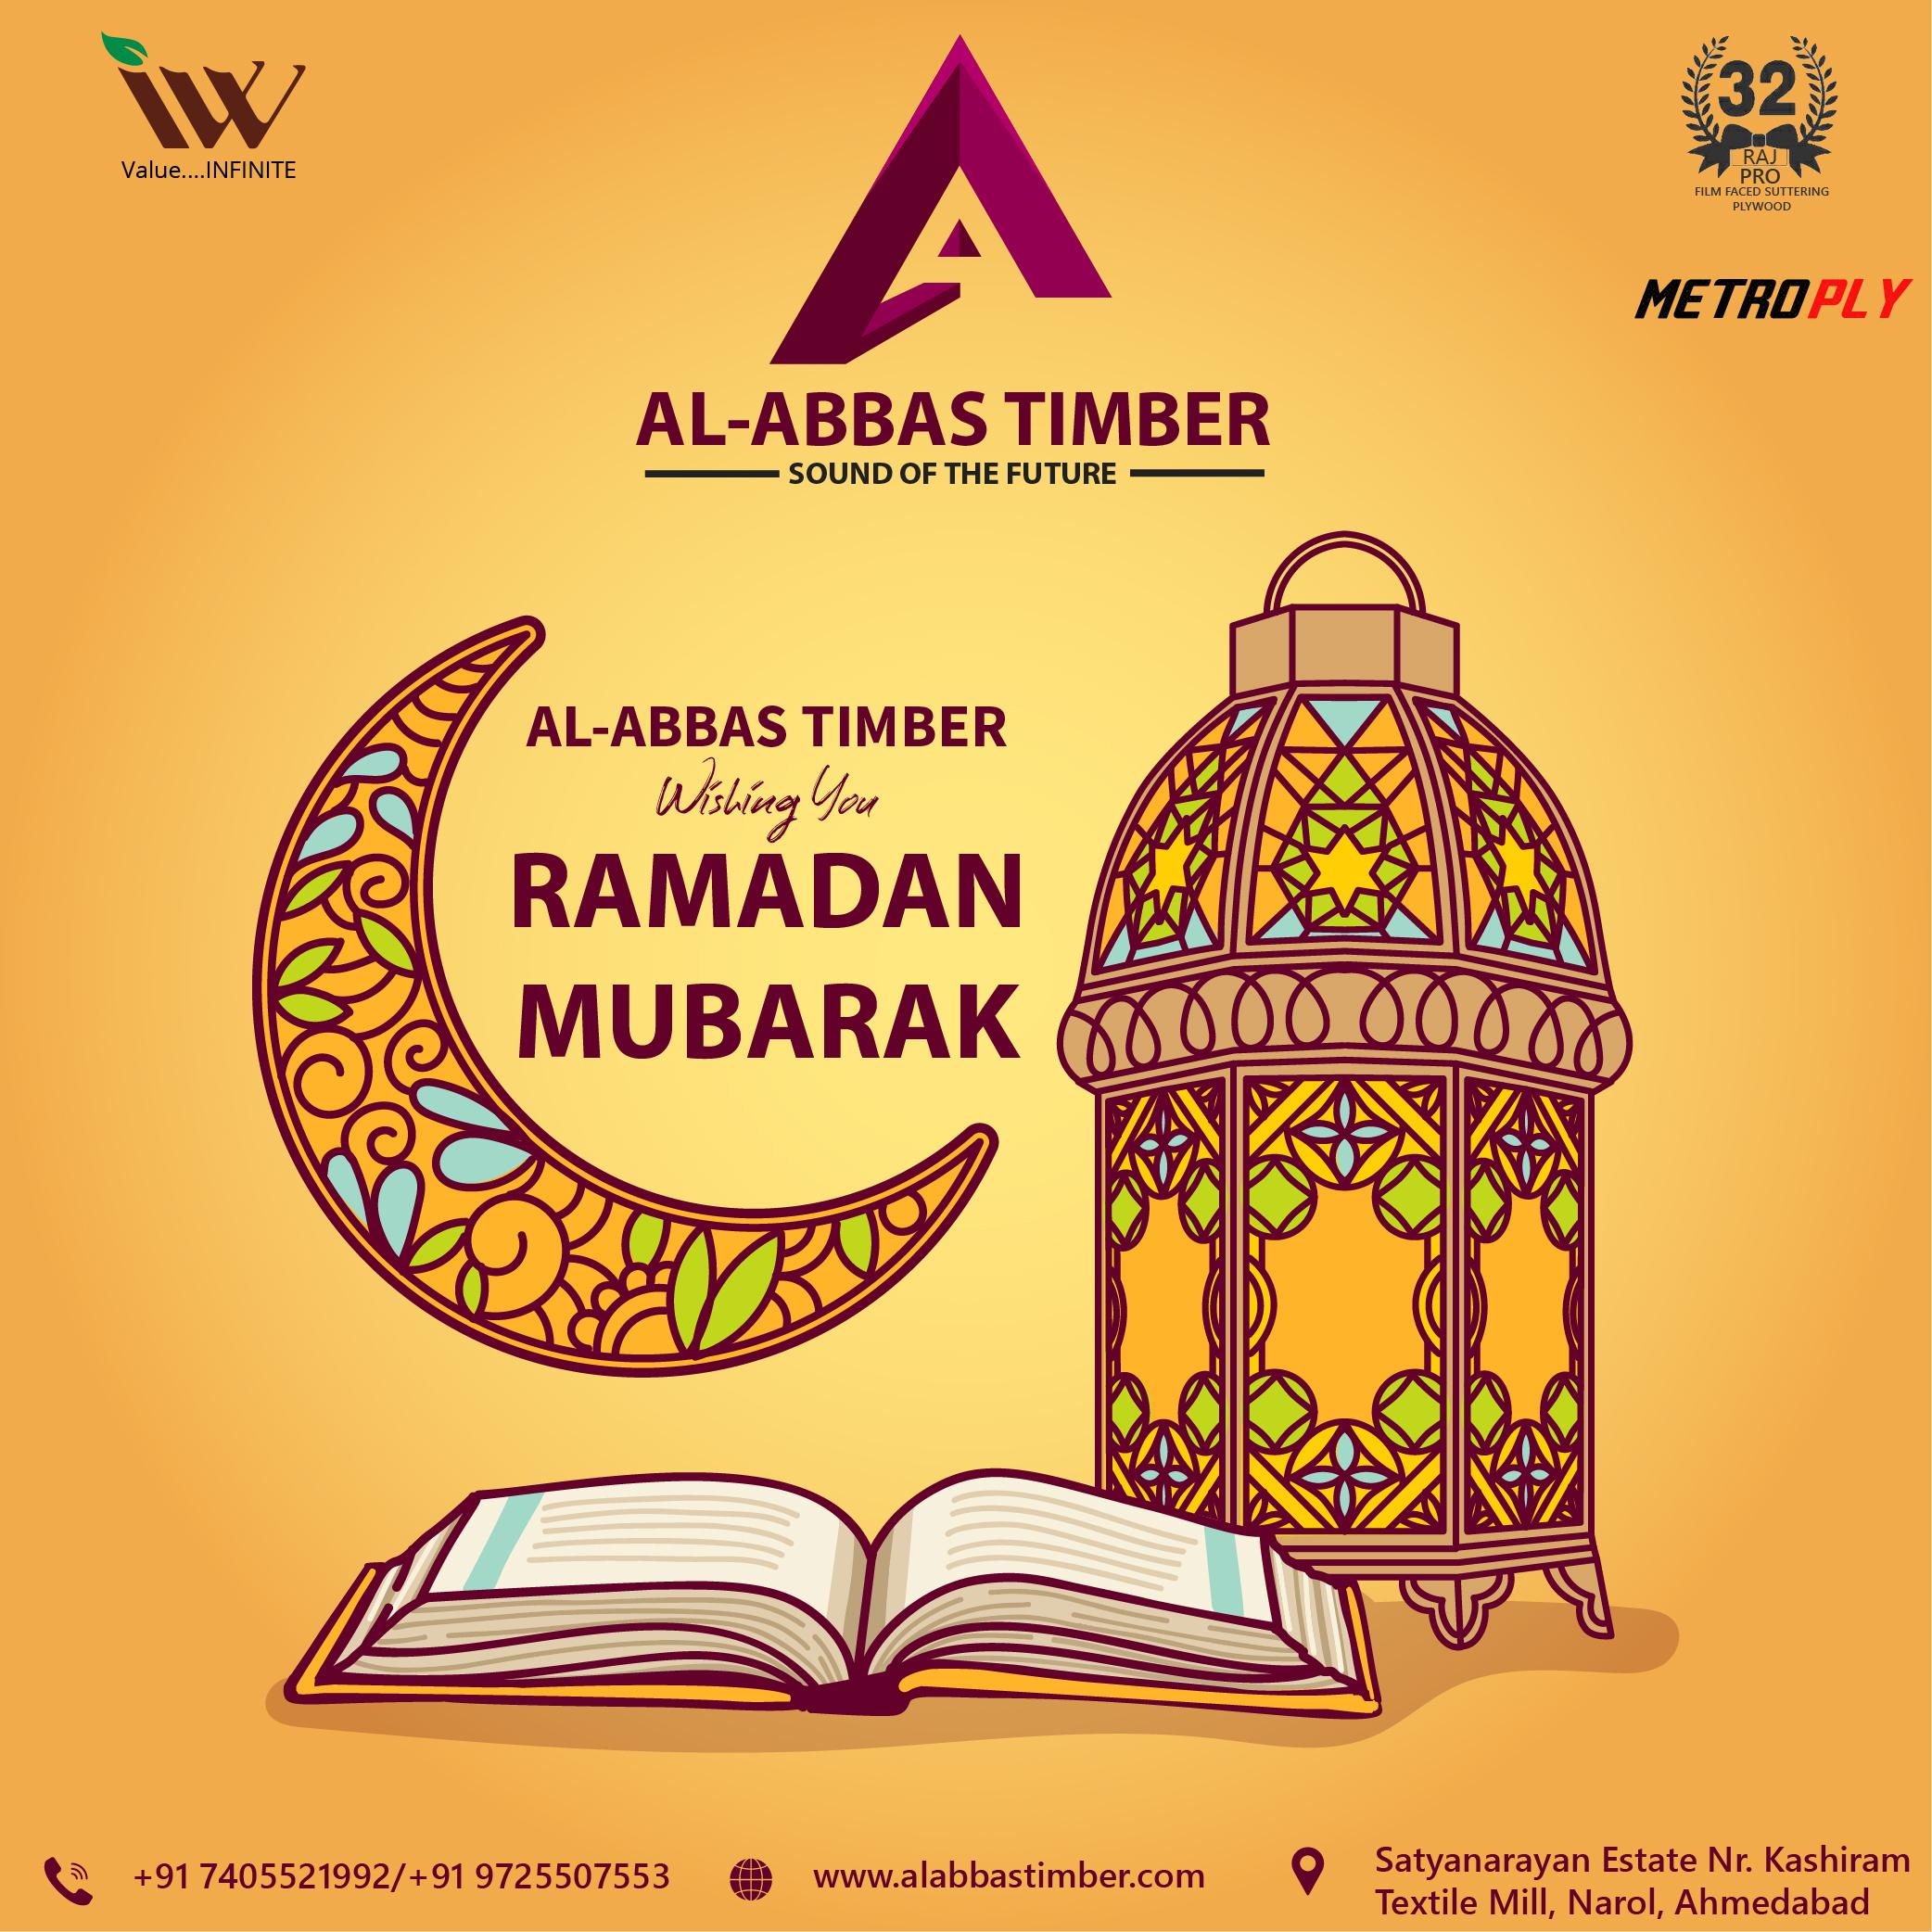 Ramadan mubarak festival post design for al abbas timber by badri design